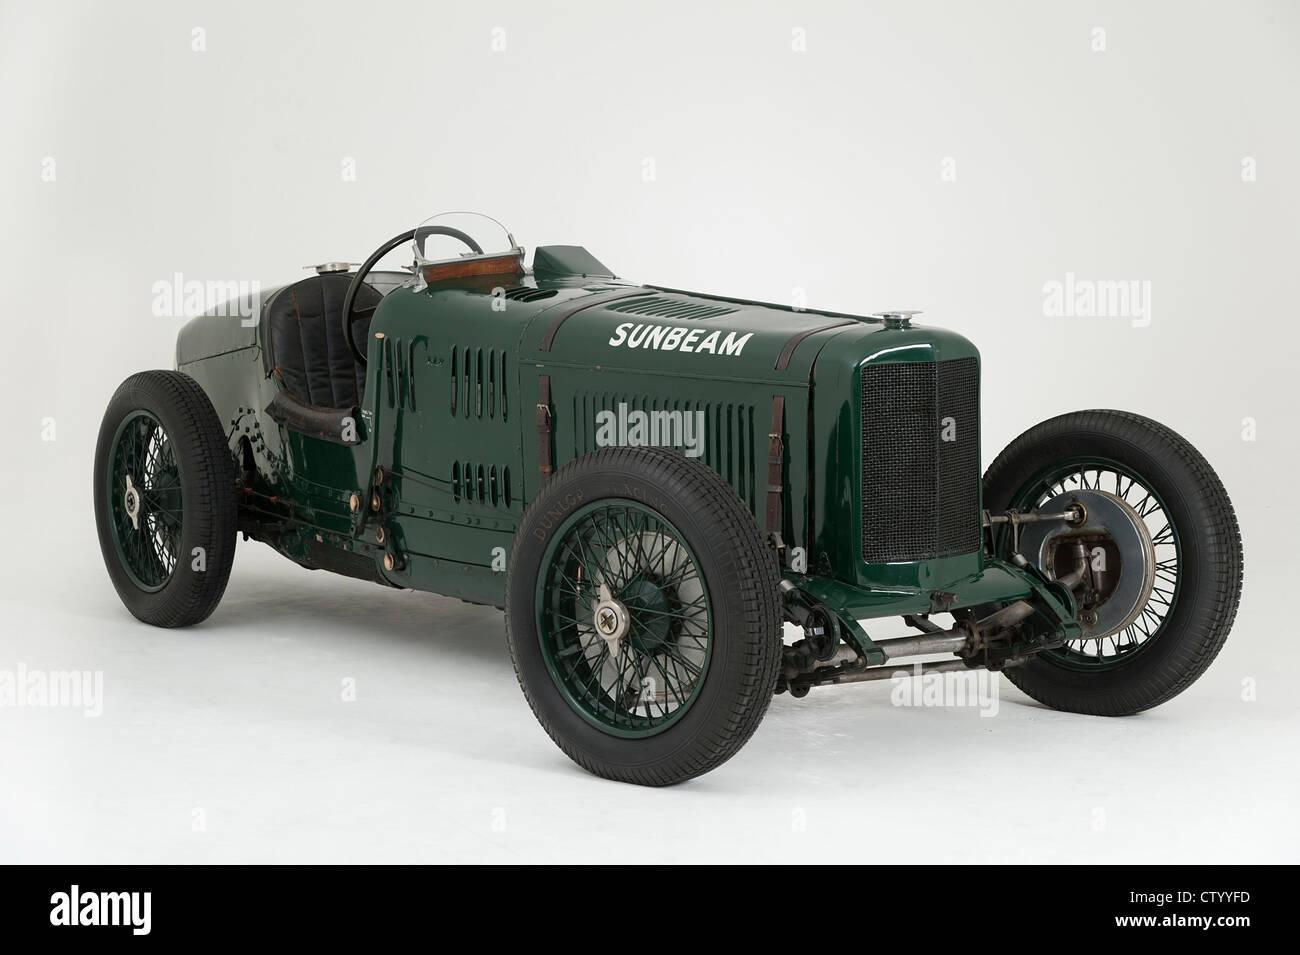 Sunbeam Cub 2 litre 1924 - Stock Image